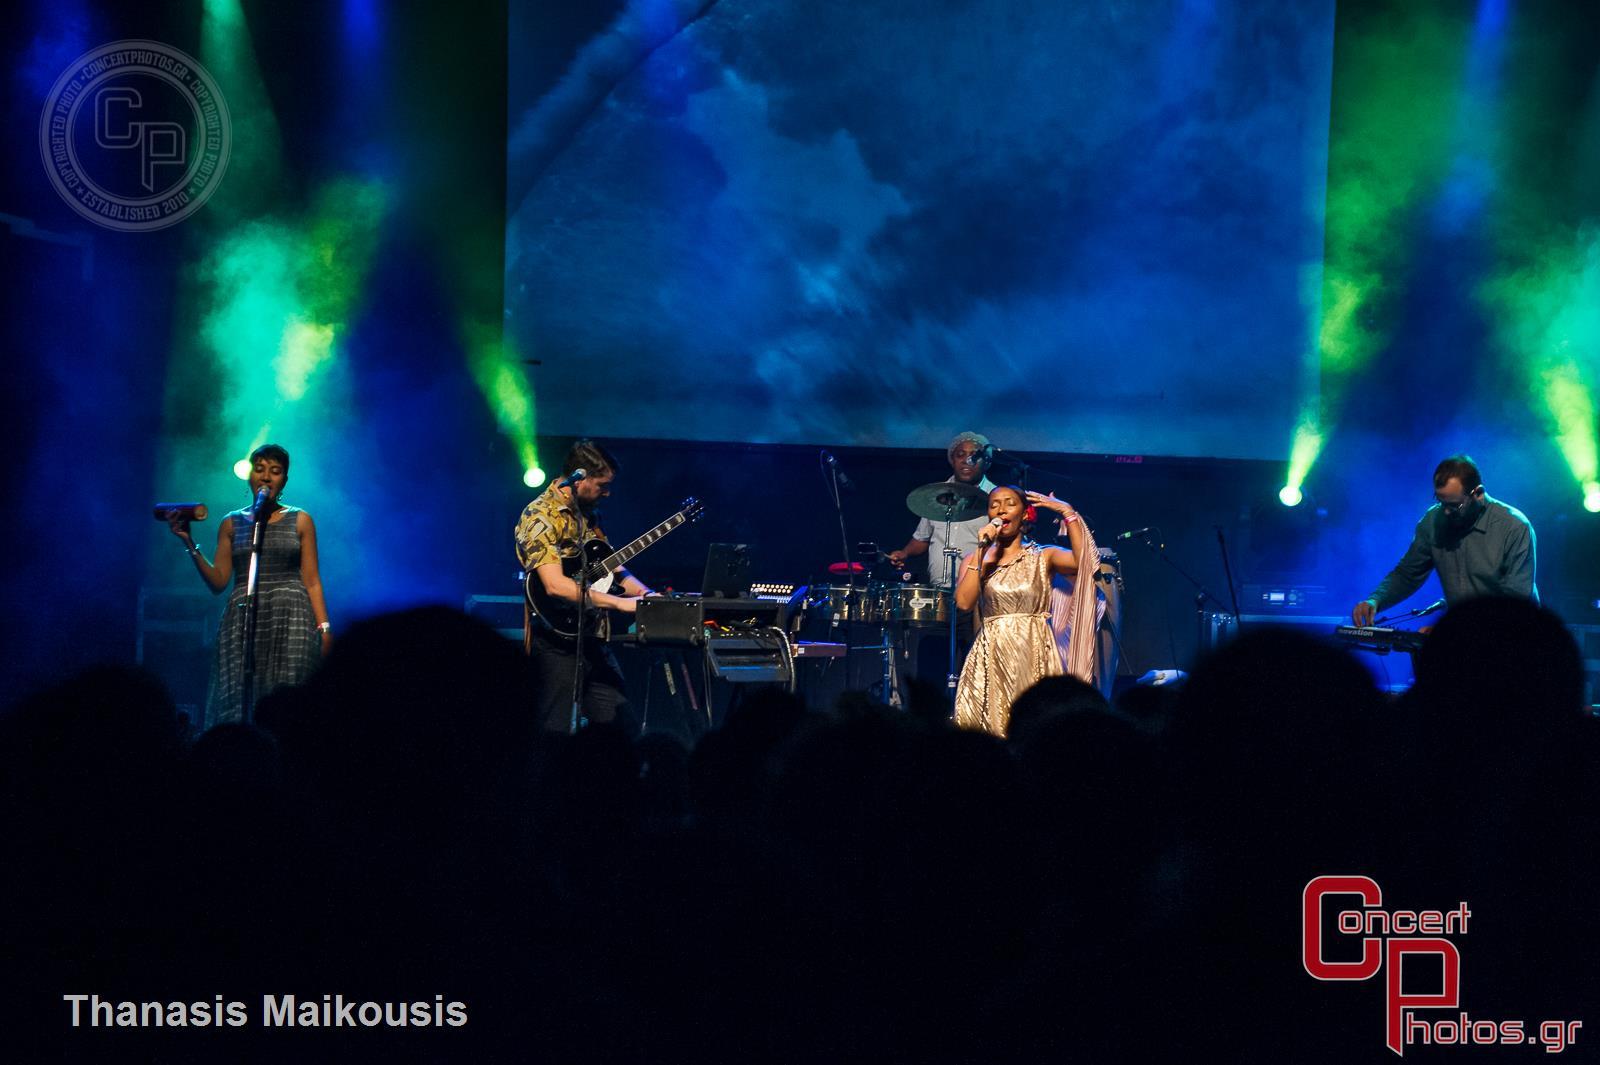 Quantic & Kill Emil -Quantic Kill Emil Gagarin photographer: Thanasis Maikousis - ConcertPhotos - 20141023_2316_01